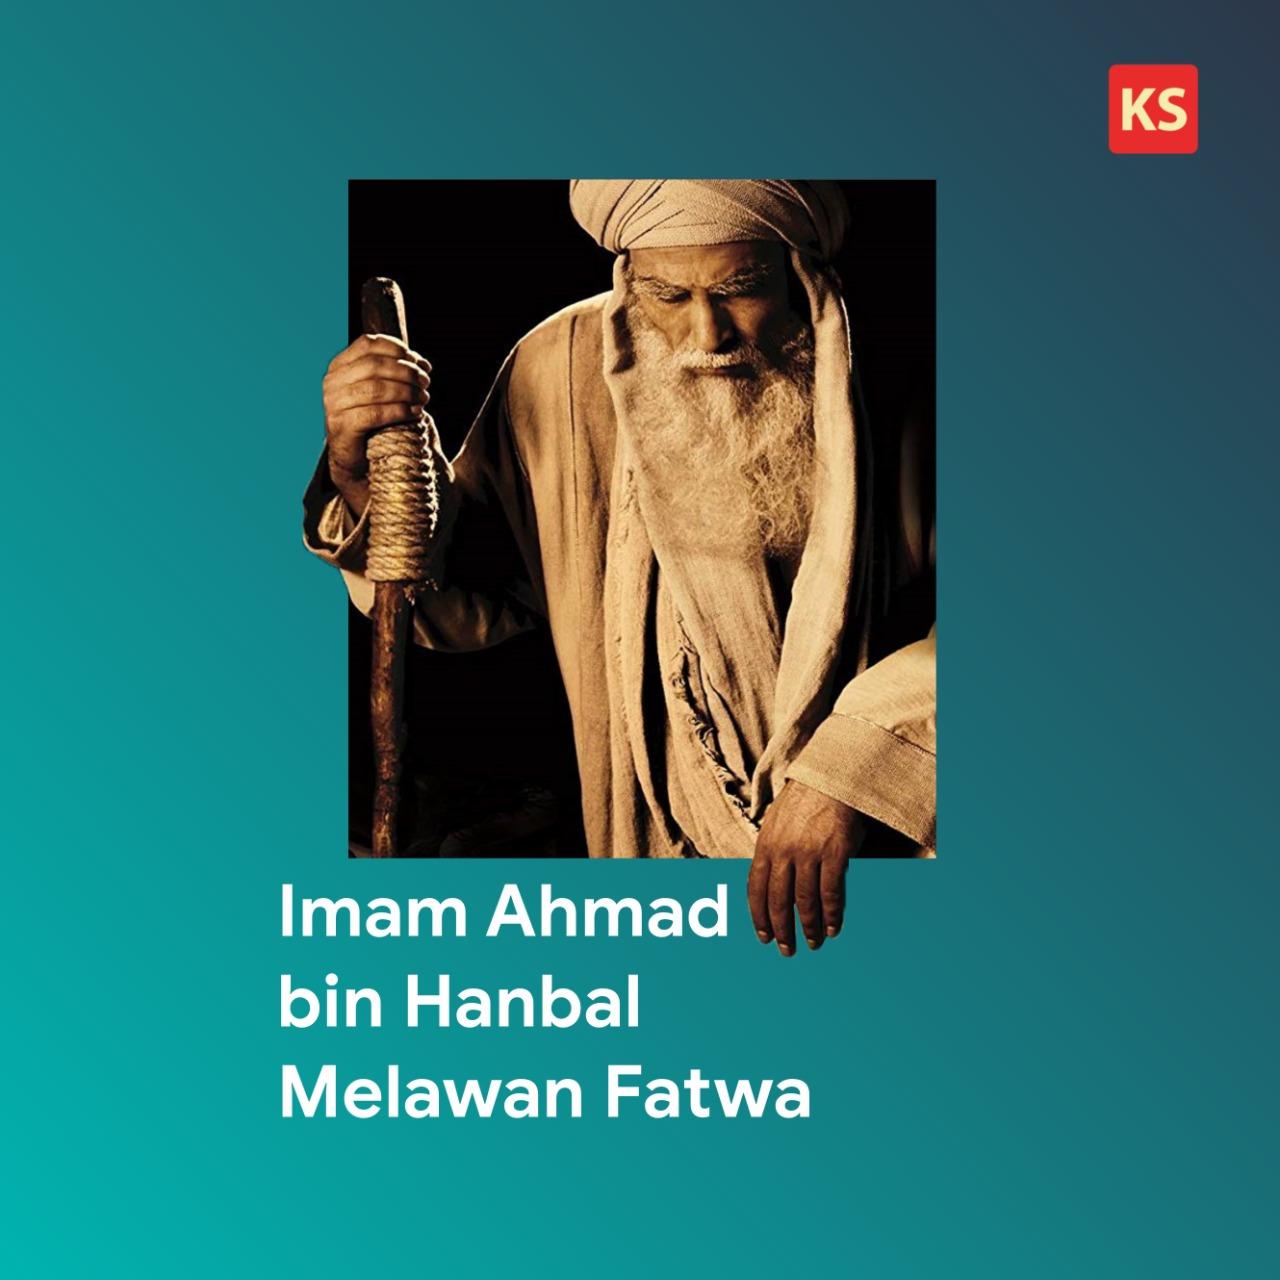 Imam Ahmad Bin Hanbal Melawan Fatwa